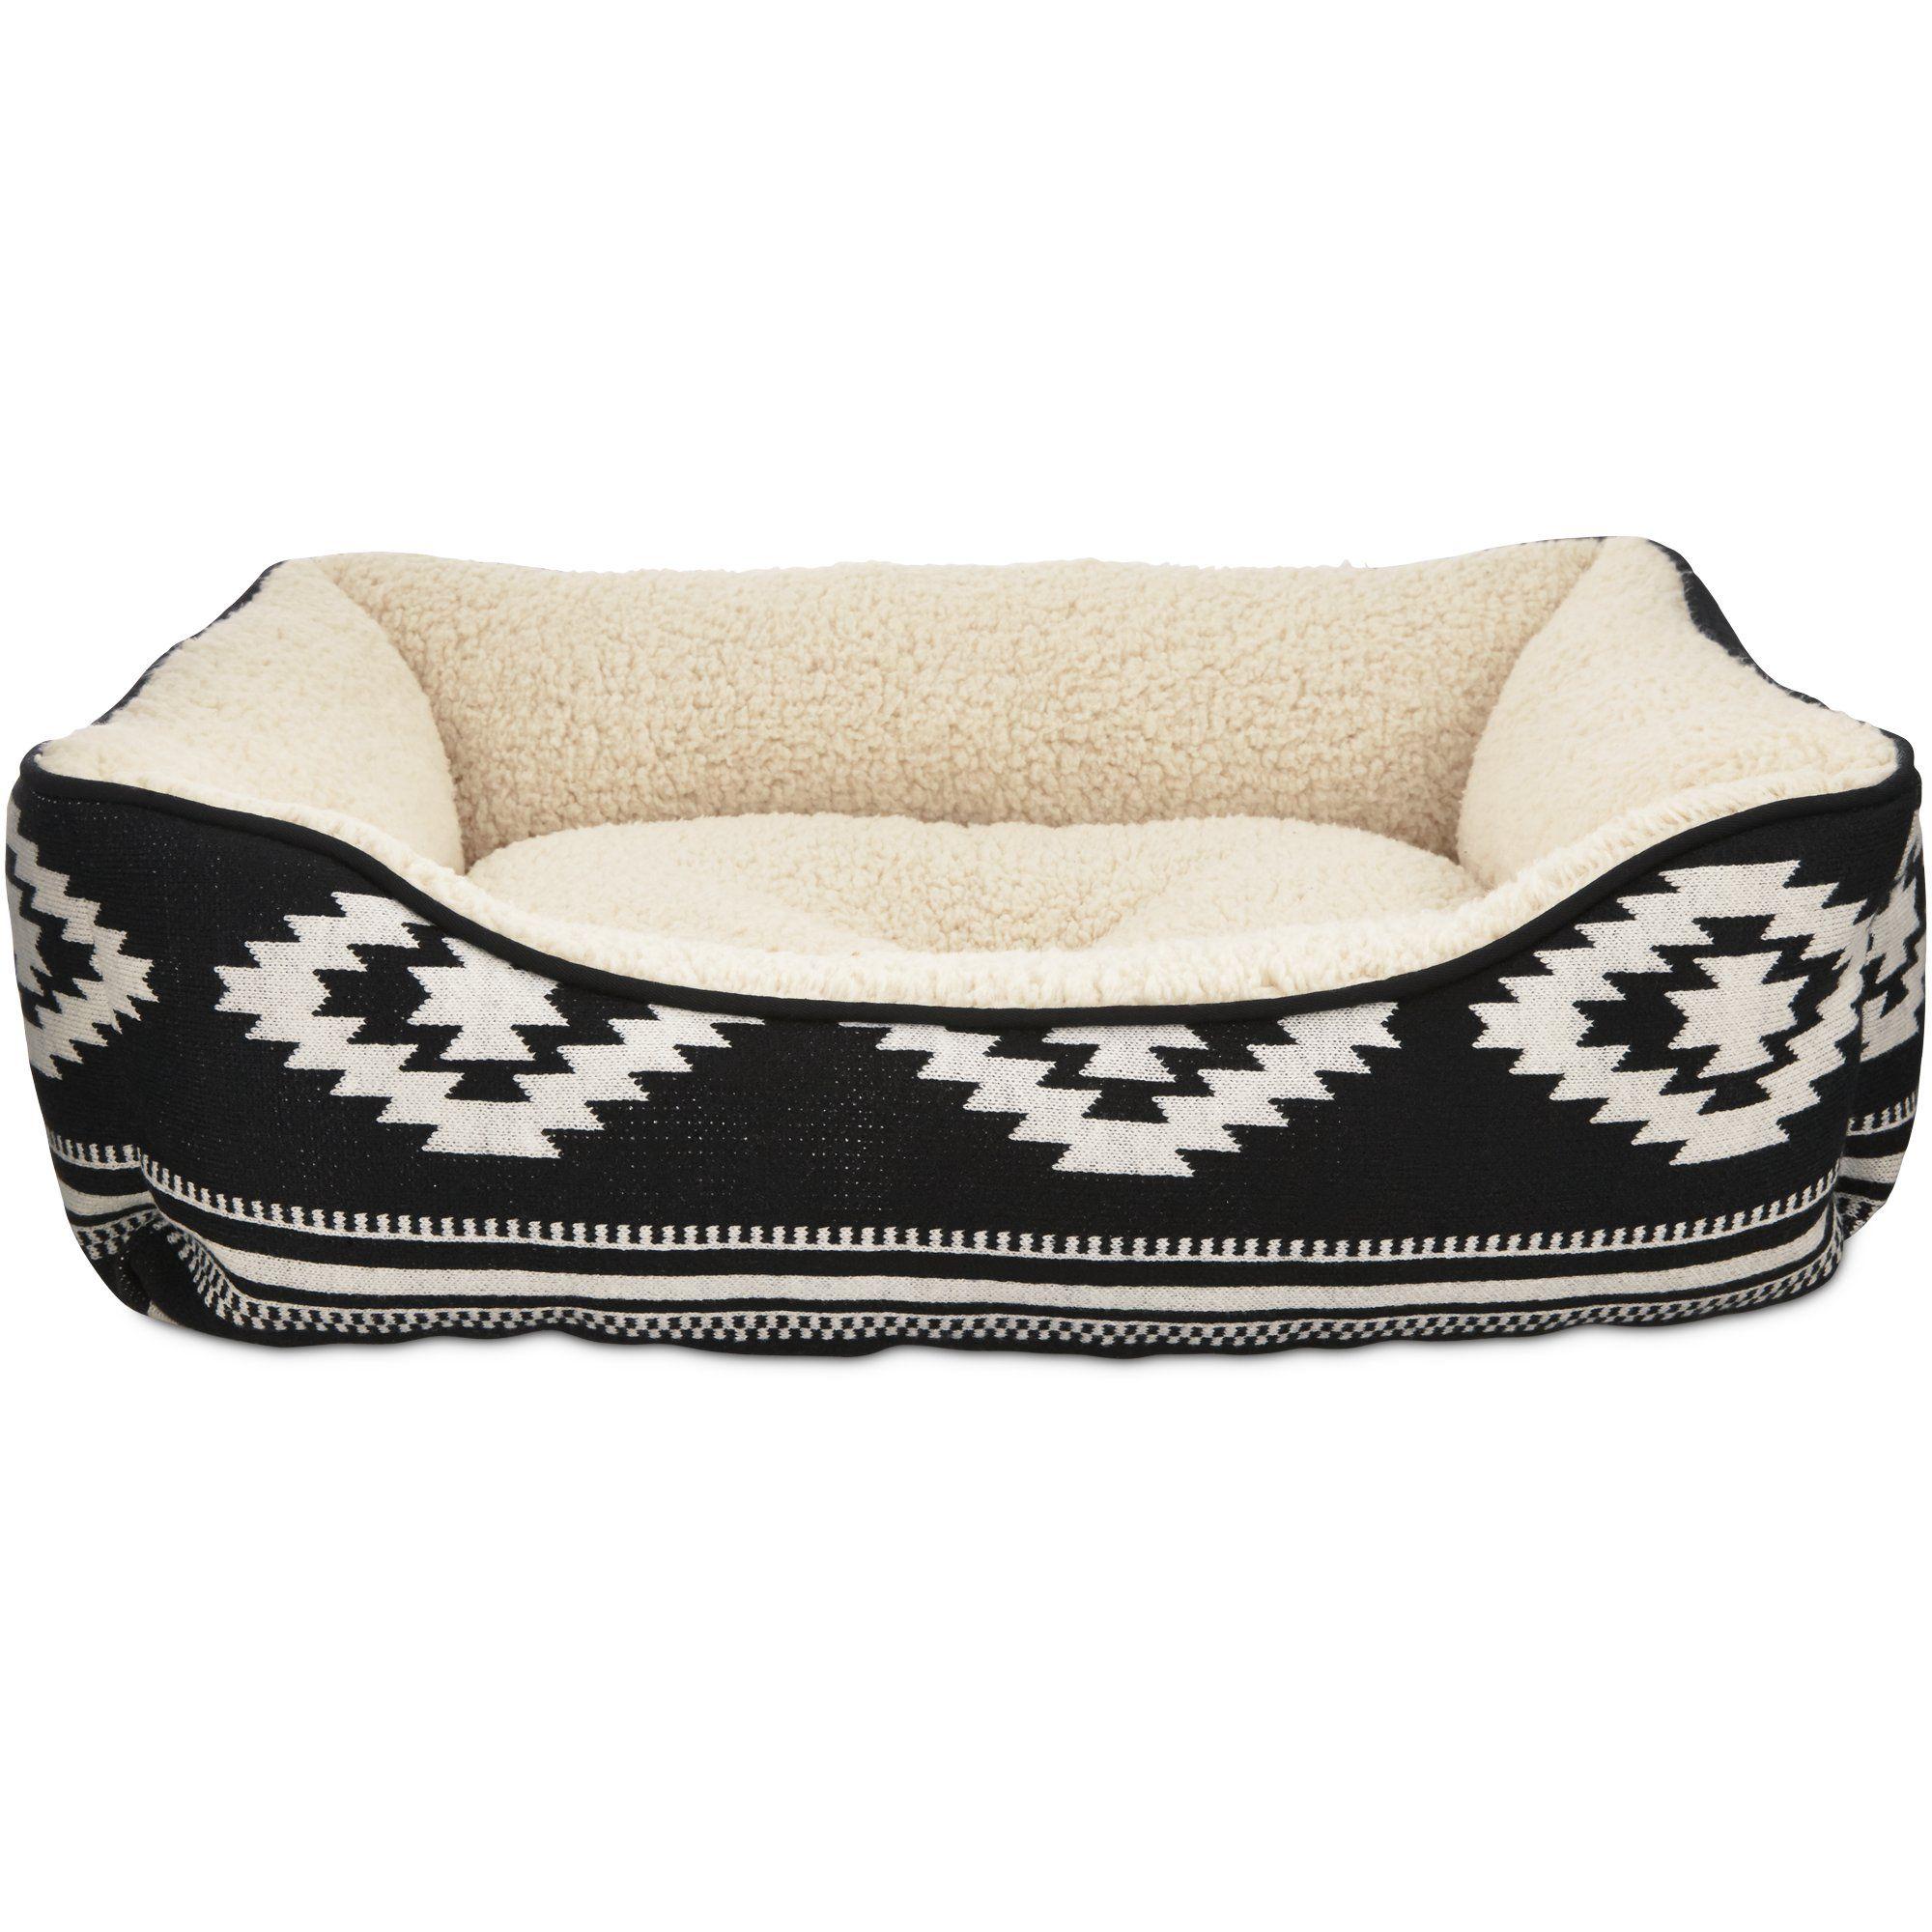 Harmony Black Aztec Dog Bed Petco Petco Dog Dog Bed Personalized Dog Beds